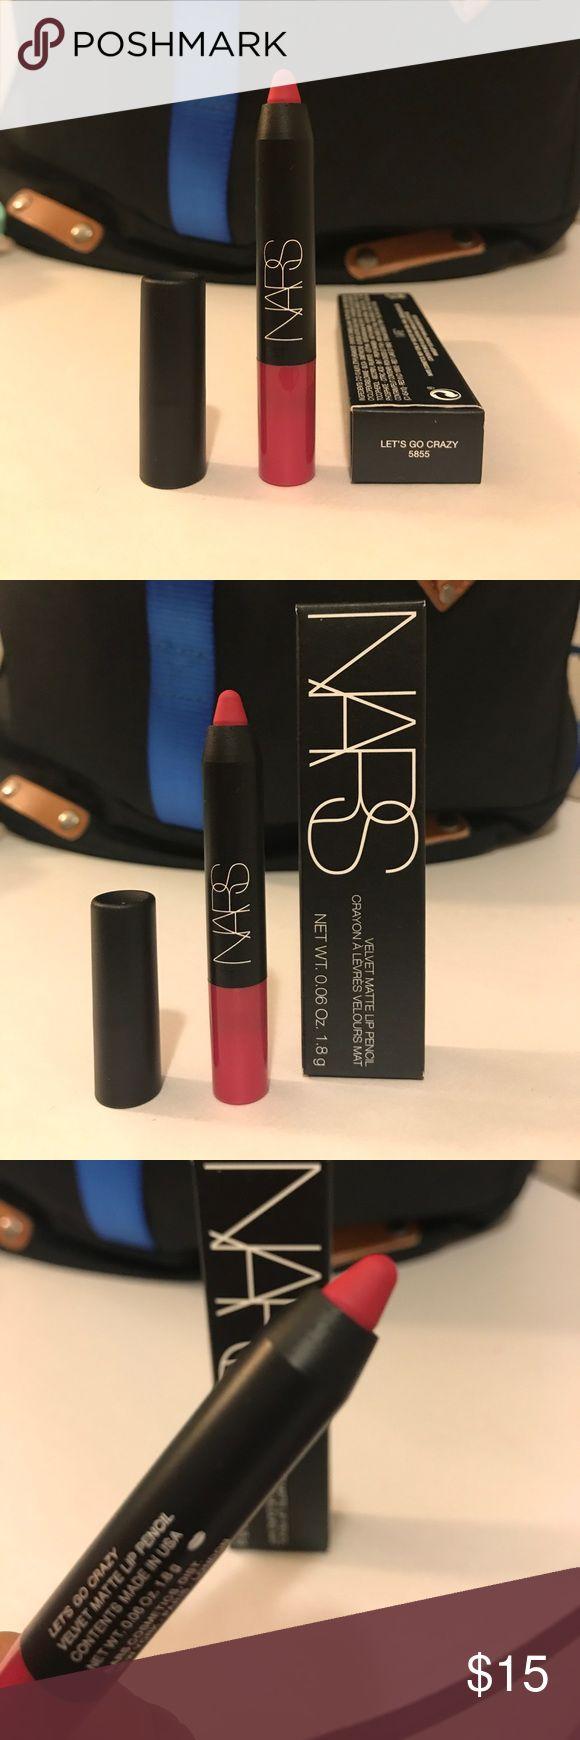 NARS Let's go crazy! Lip ✏️ Pencil Brand new. Make me an offer! NARS Makeup Lipstick